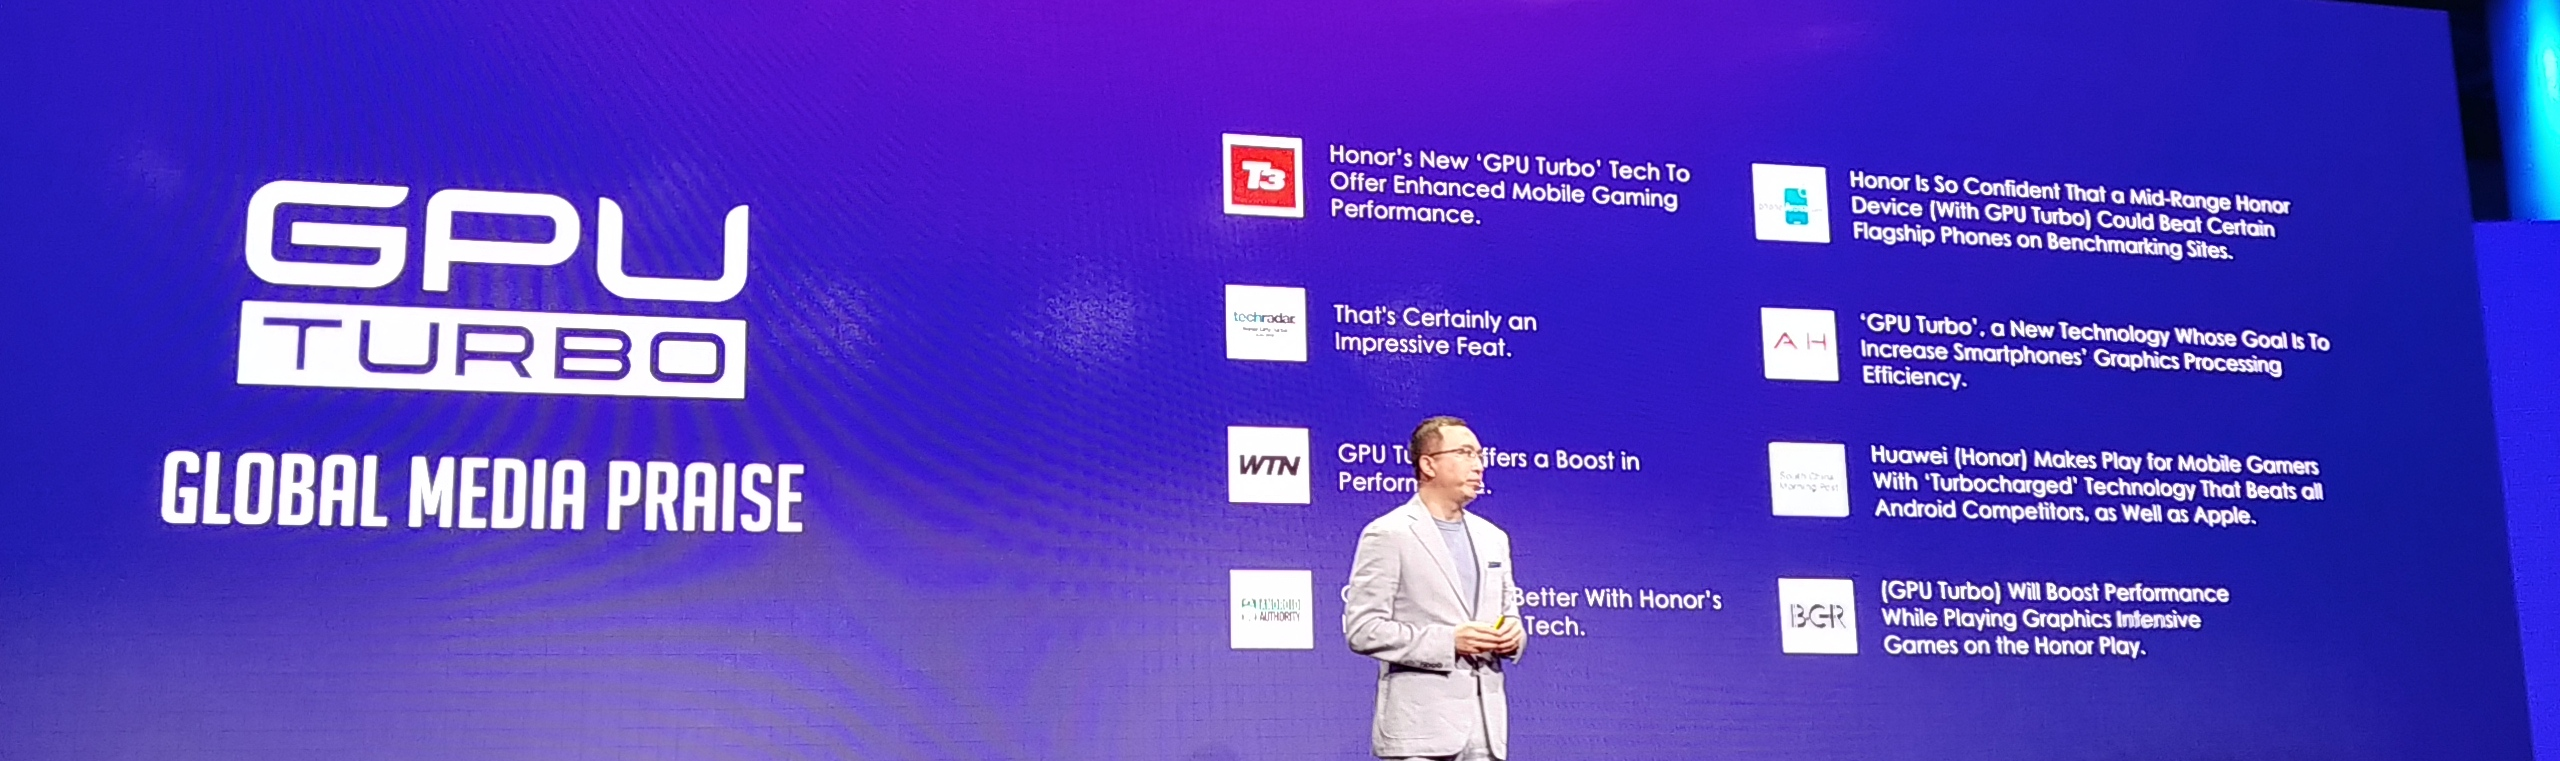 Huawei's GPU Turbo: Valid Technology with Overzealous Marketing